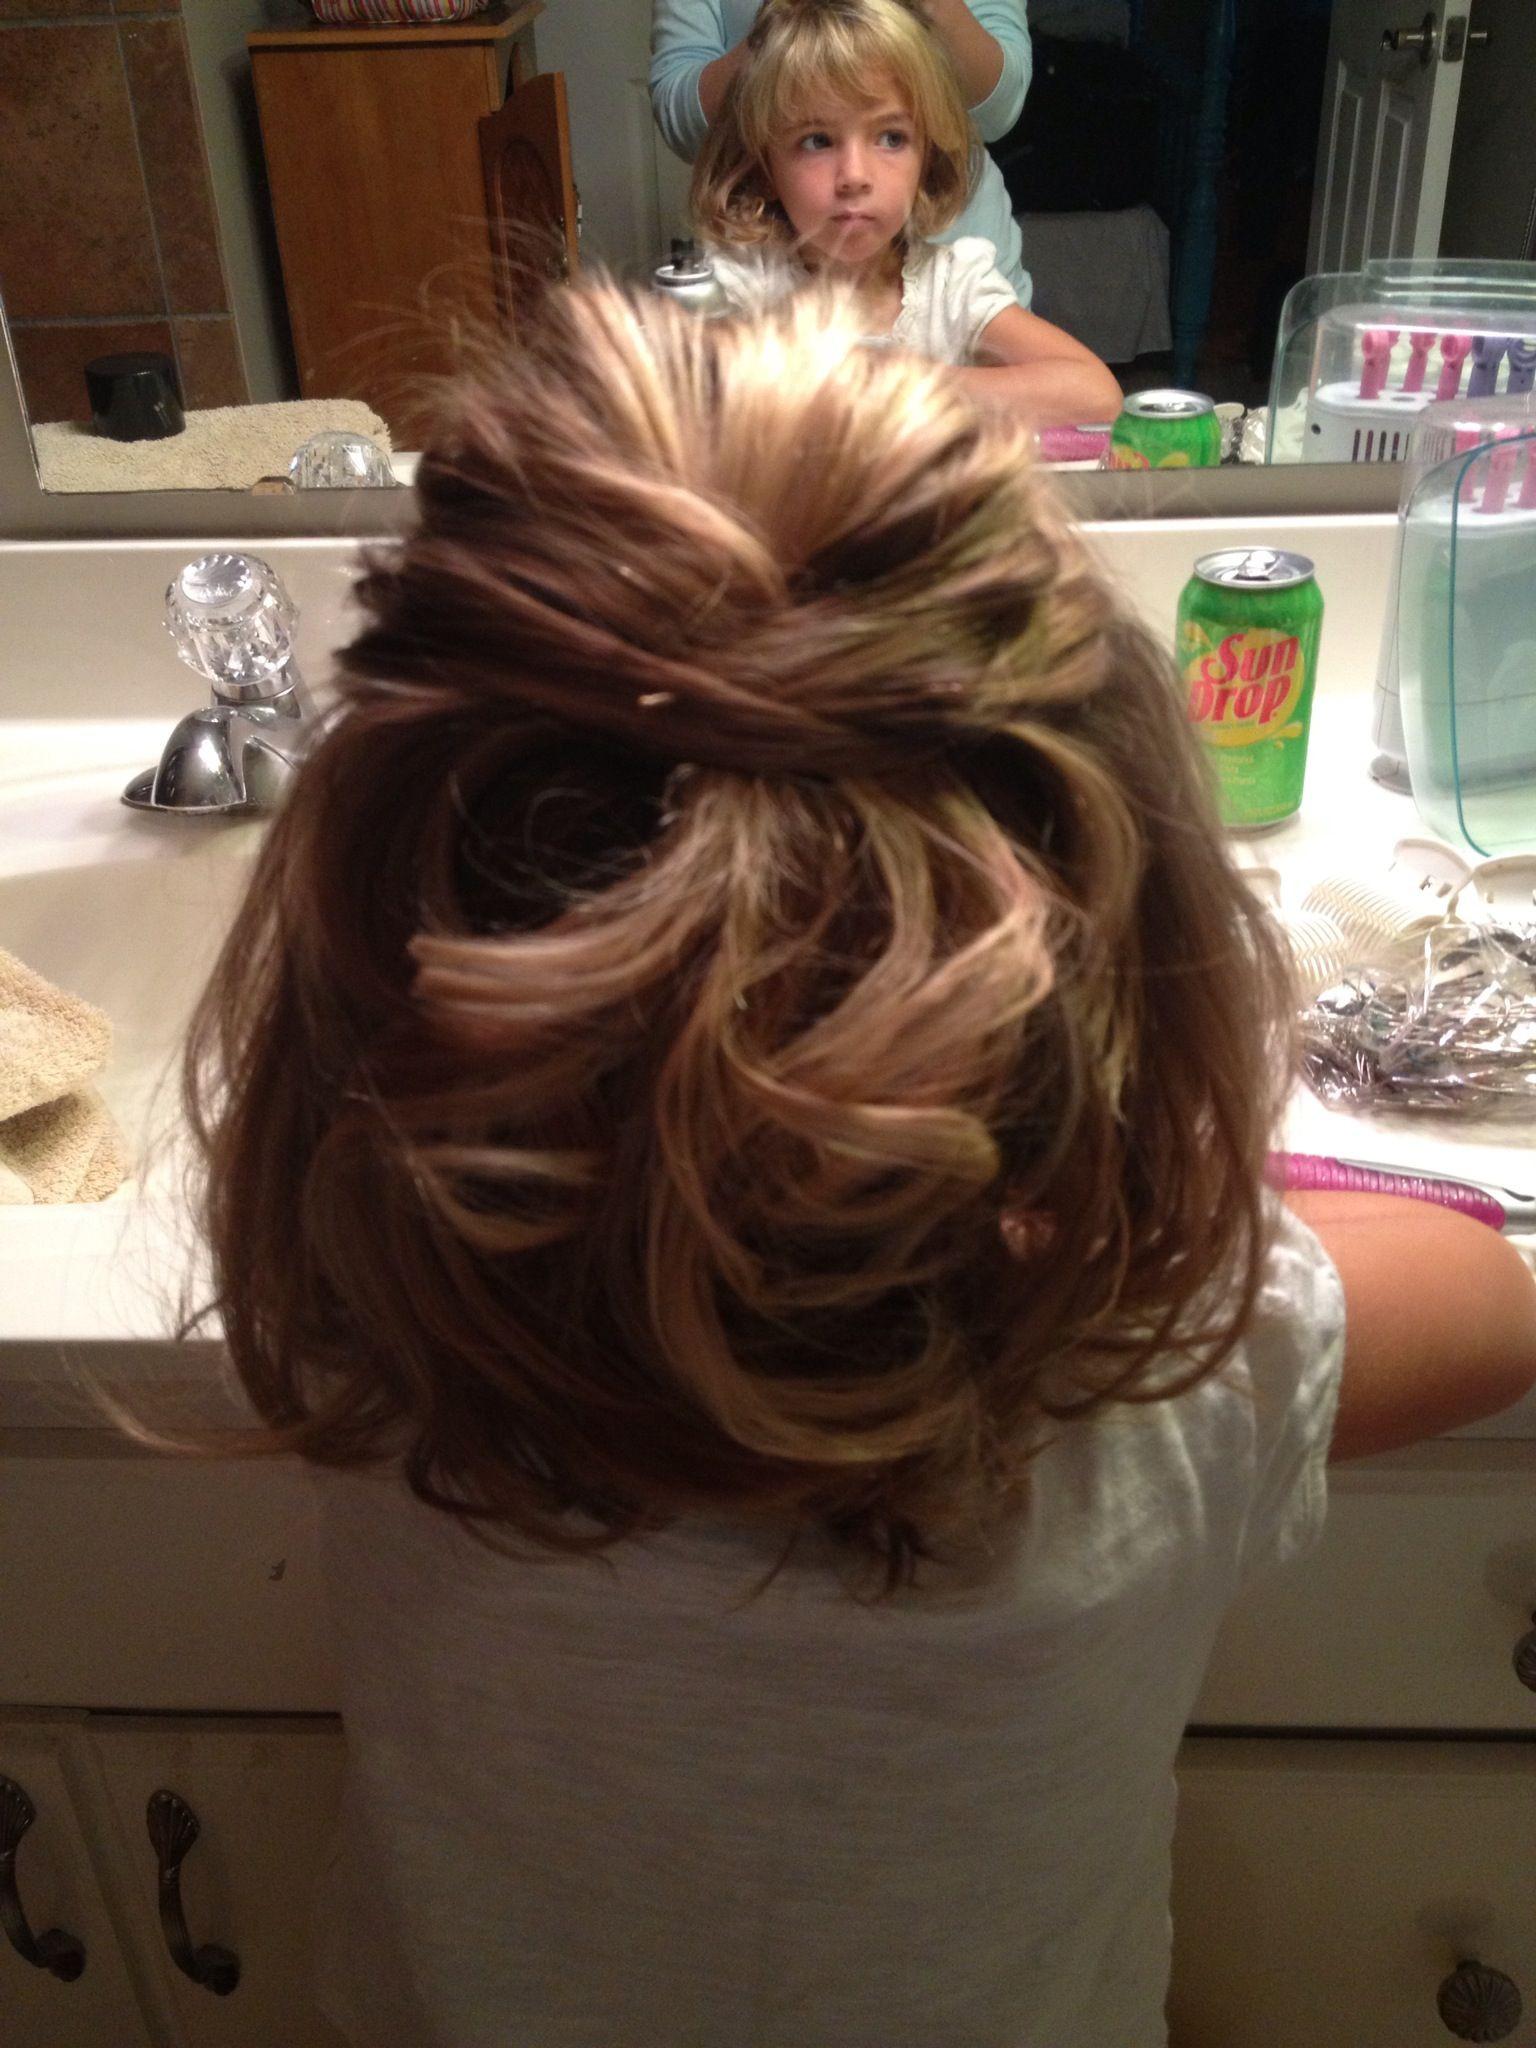 Hairstyles For Little Girls For Weddings  Little girls wedding hair My niece Annabel loved her